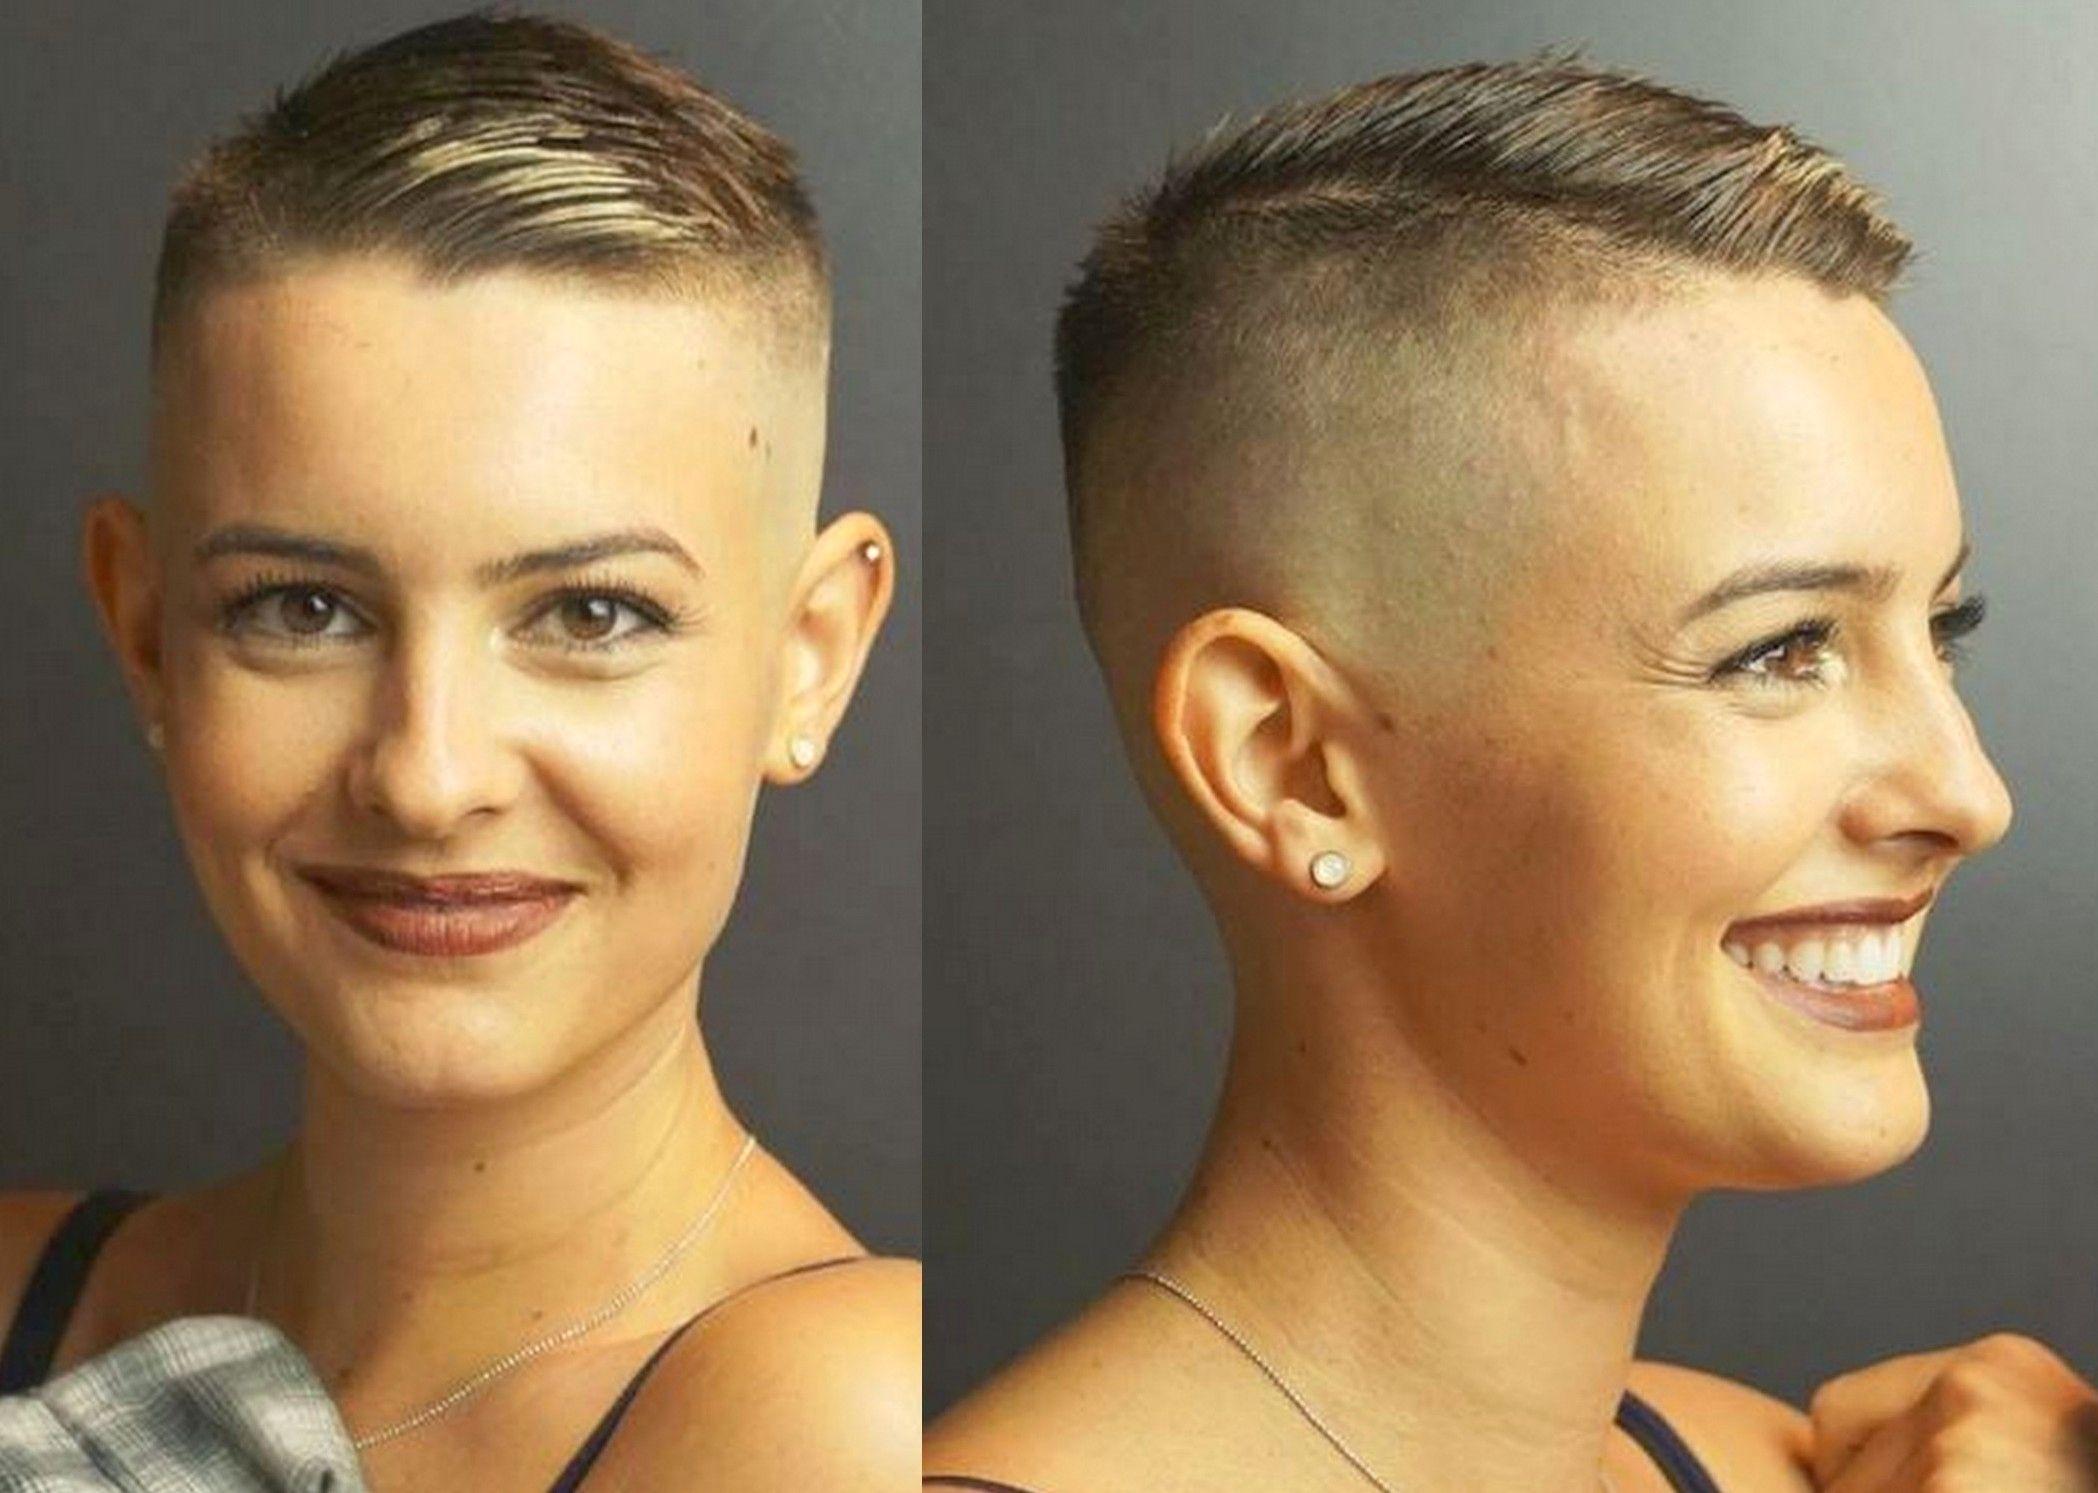 Pixie Hair Cut Styles: What Do You Think Of Lady Fades? @treygraf_hair